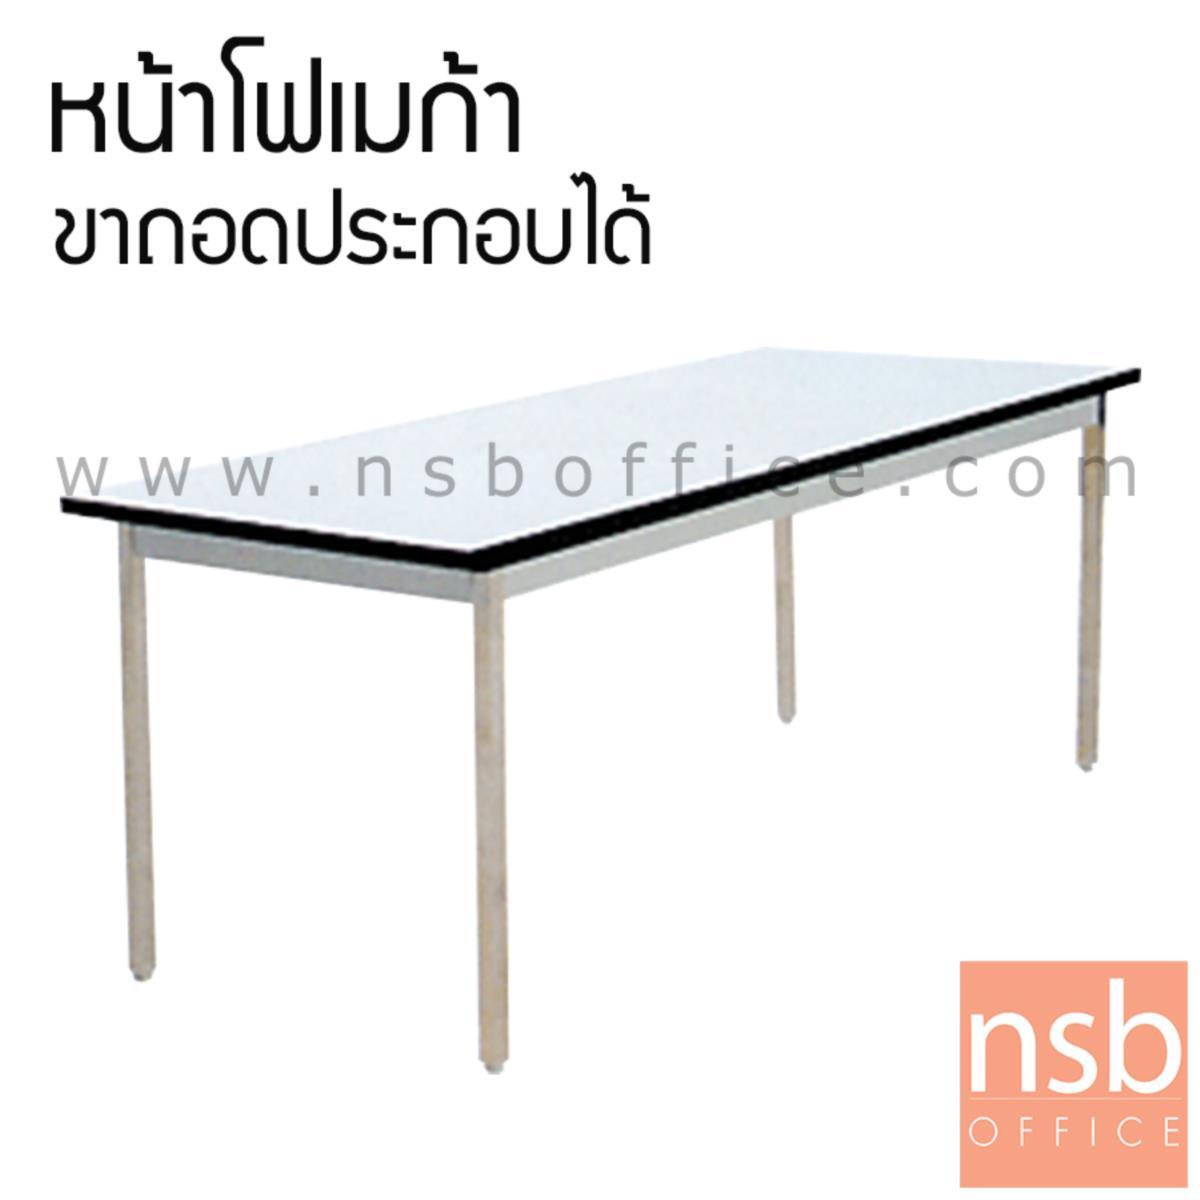 A07A030:โต๊ะหน้าโฟเมก้าขาว 25 มม. รุ่น Blondie (บลอนดี้) ขนาด 4 ,5 ,6 ฟุต ขาเหล็กเหลี่ยมถอดประกอบได้